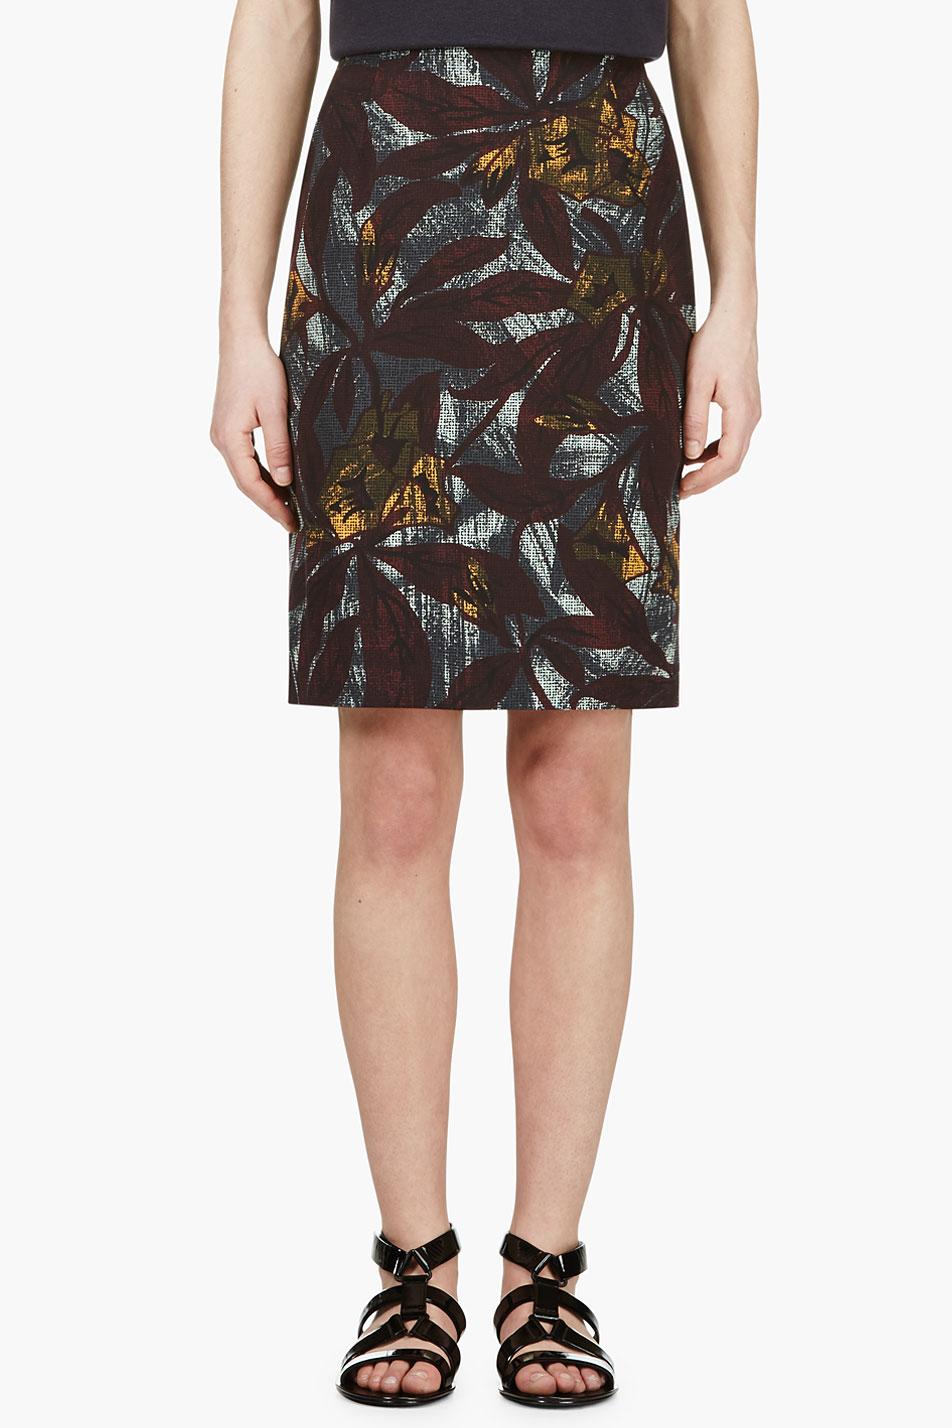 Marc jacobs plum and teal leaf printed pencil skirt